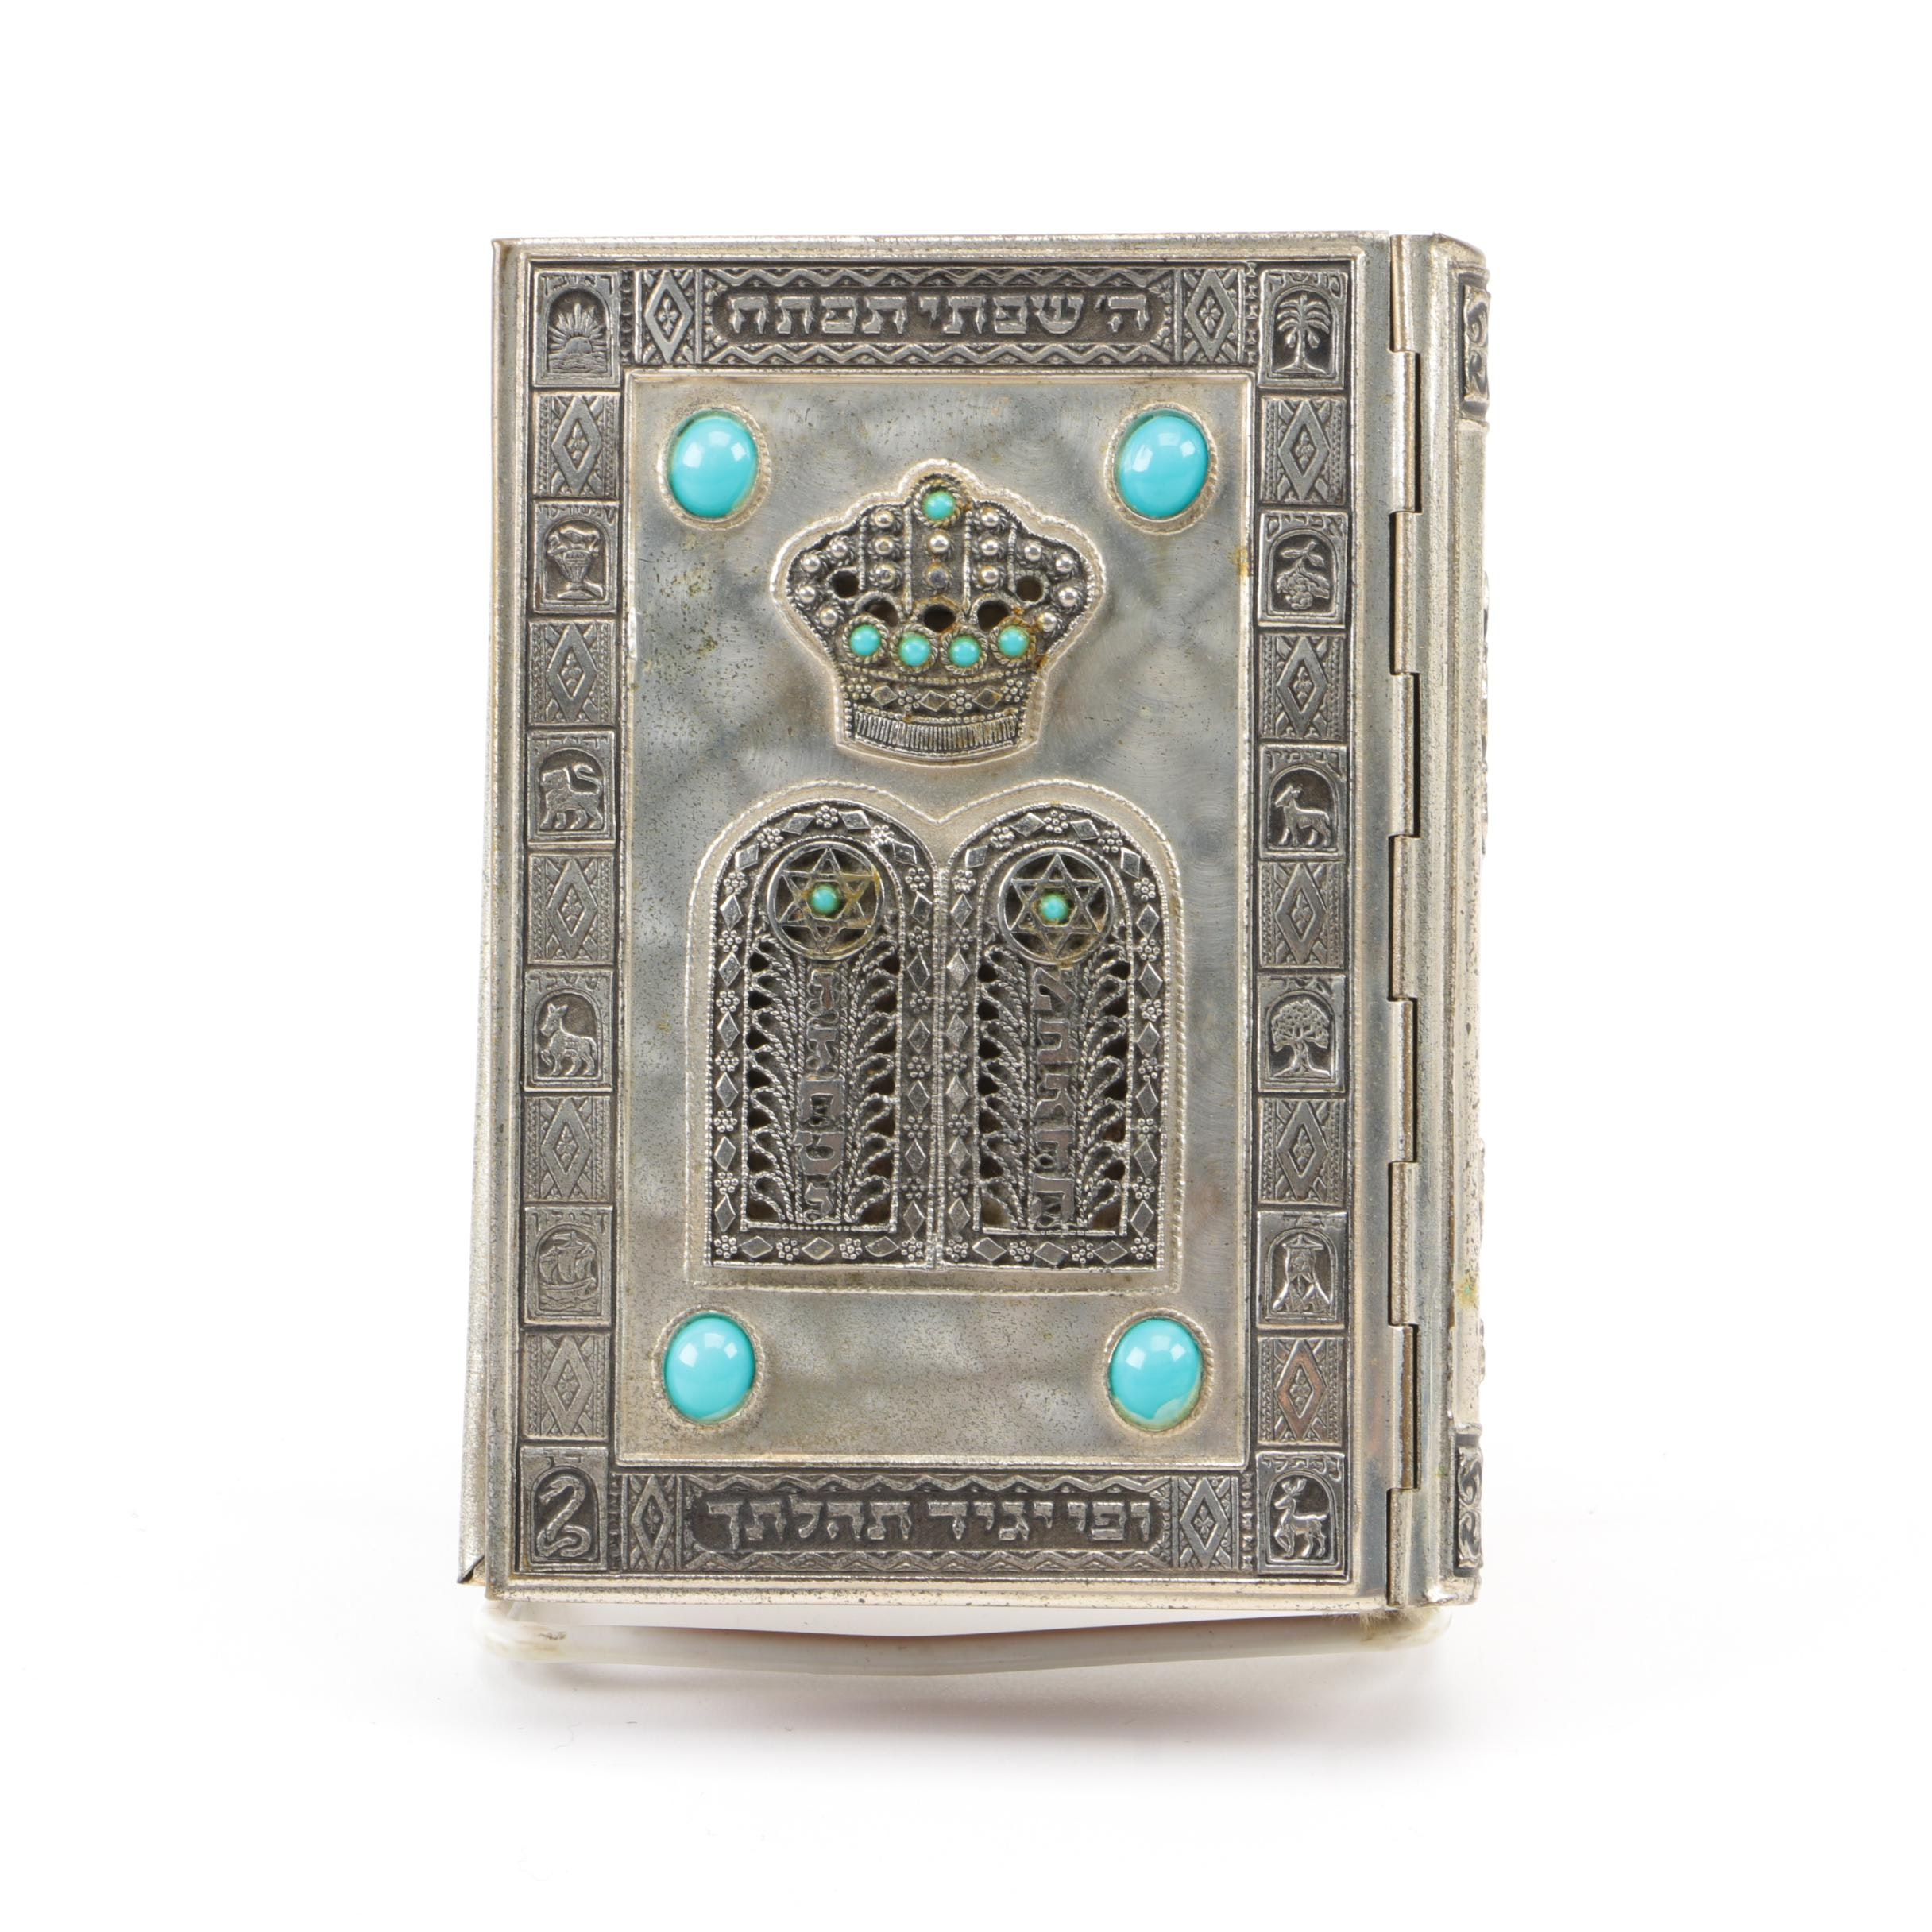 Metal-Bound Jewish Prayer Book